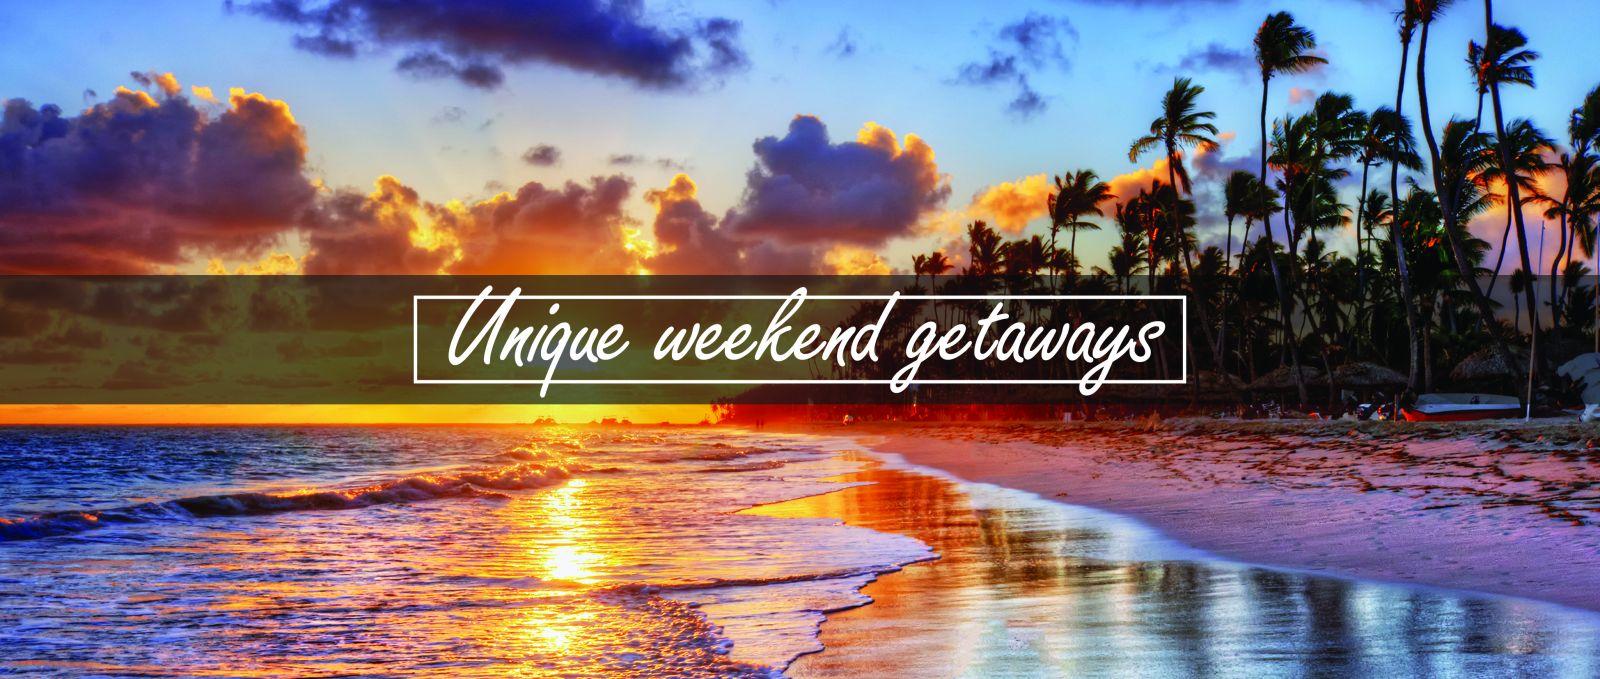 unique weekend getaways bali